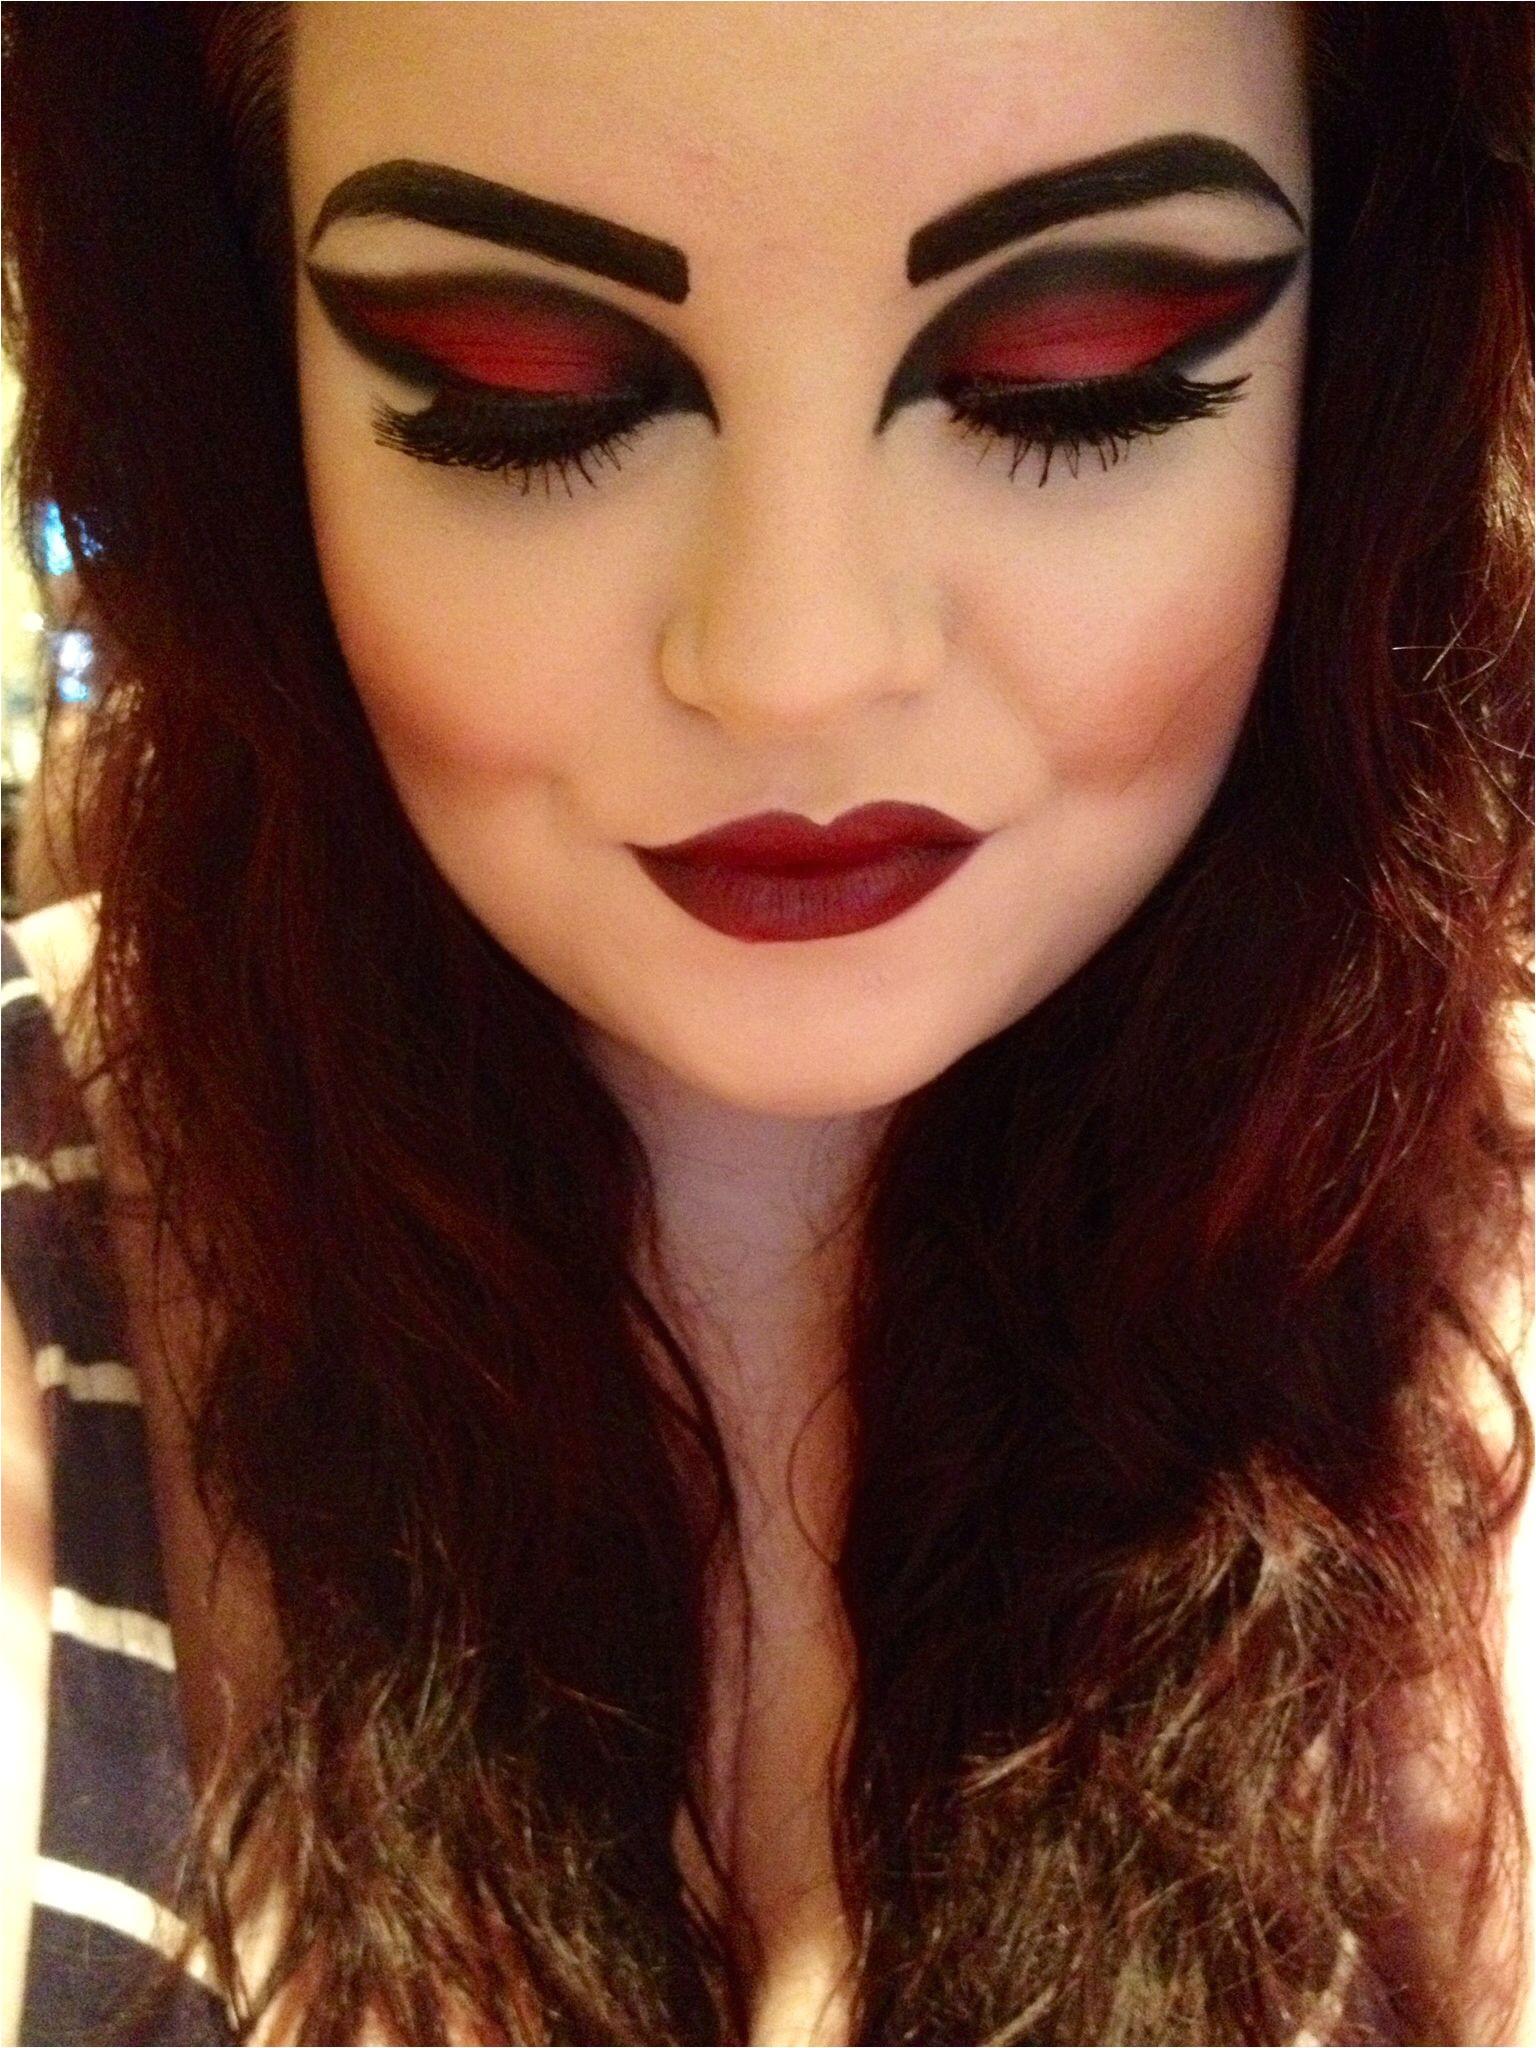 Vampire Hairstyles for Girls Vampire Halloween Makeup My Own Makeup Looks Pinterest